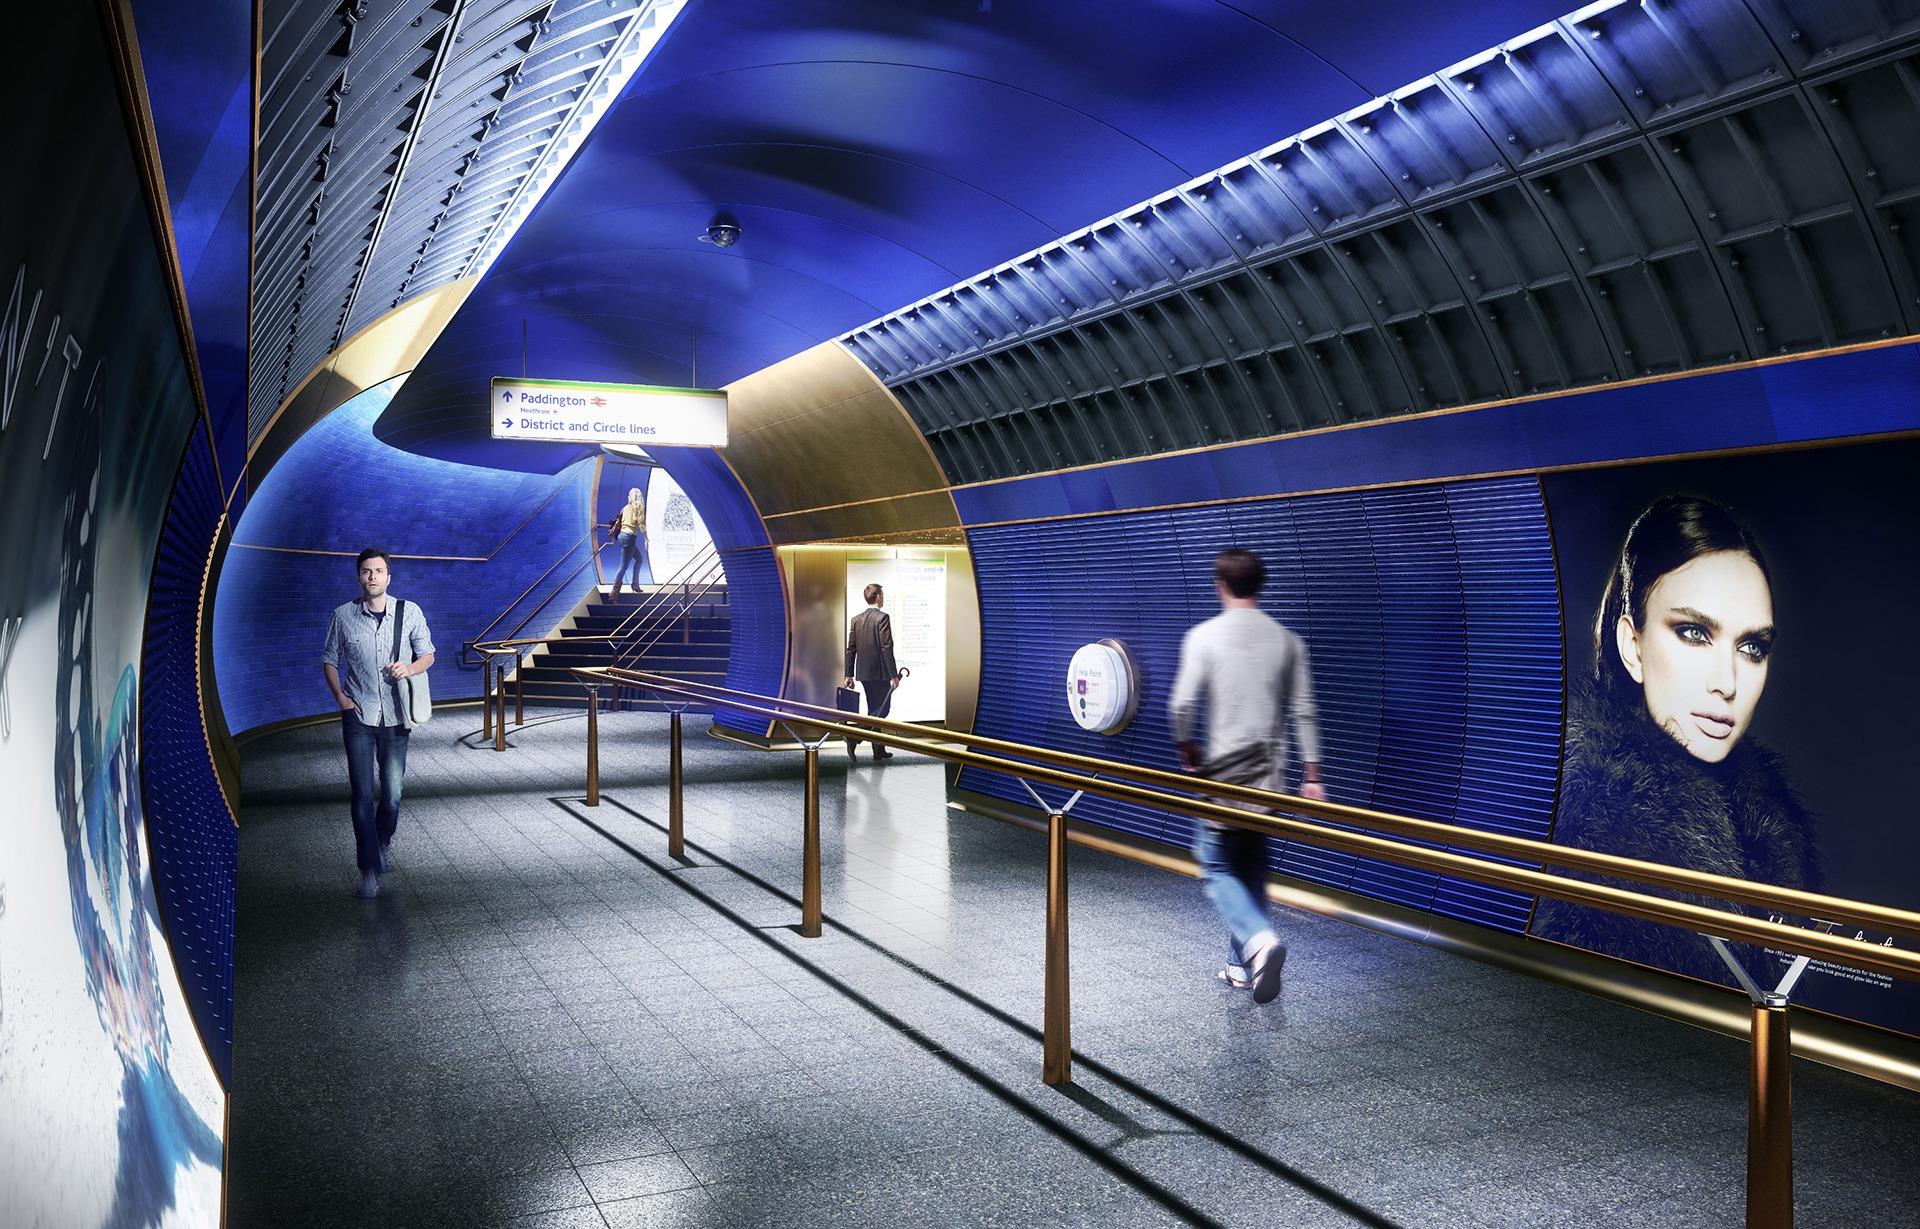 stas3dart-london-underground-ava-architecture-studio-egret-west-promotional-image-modelling-gallery2